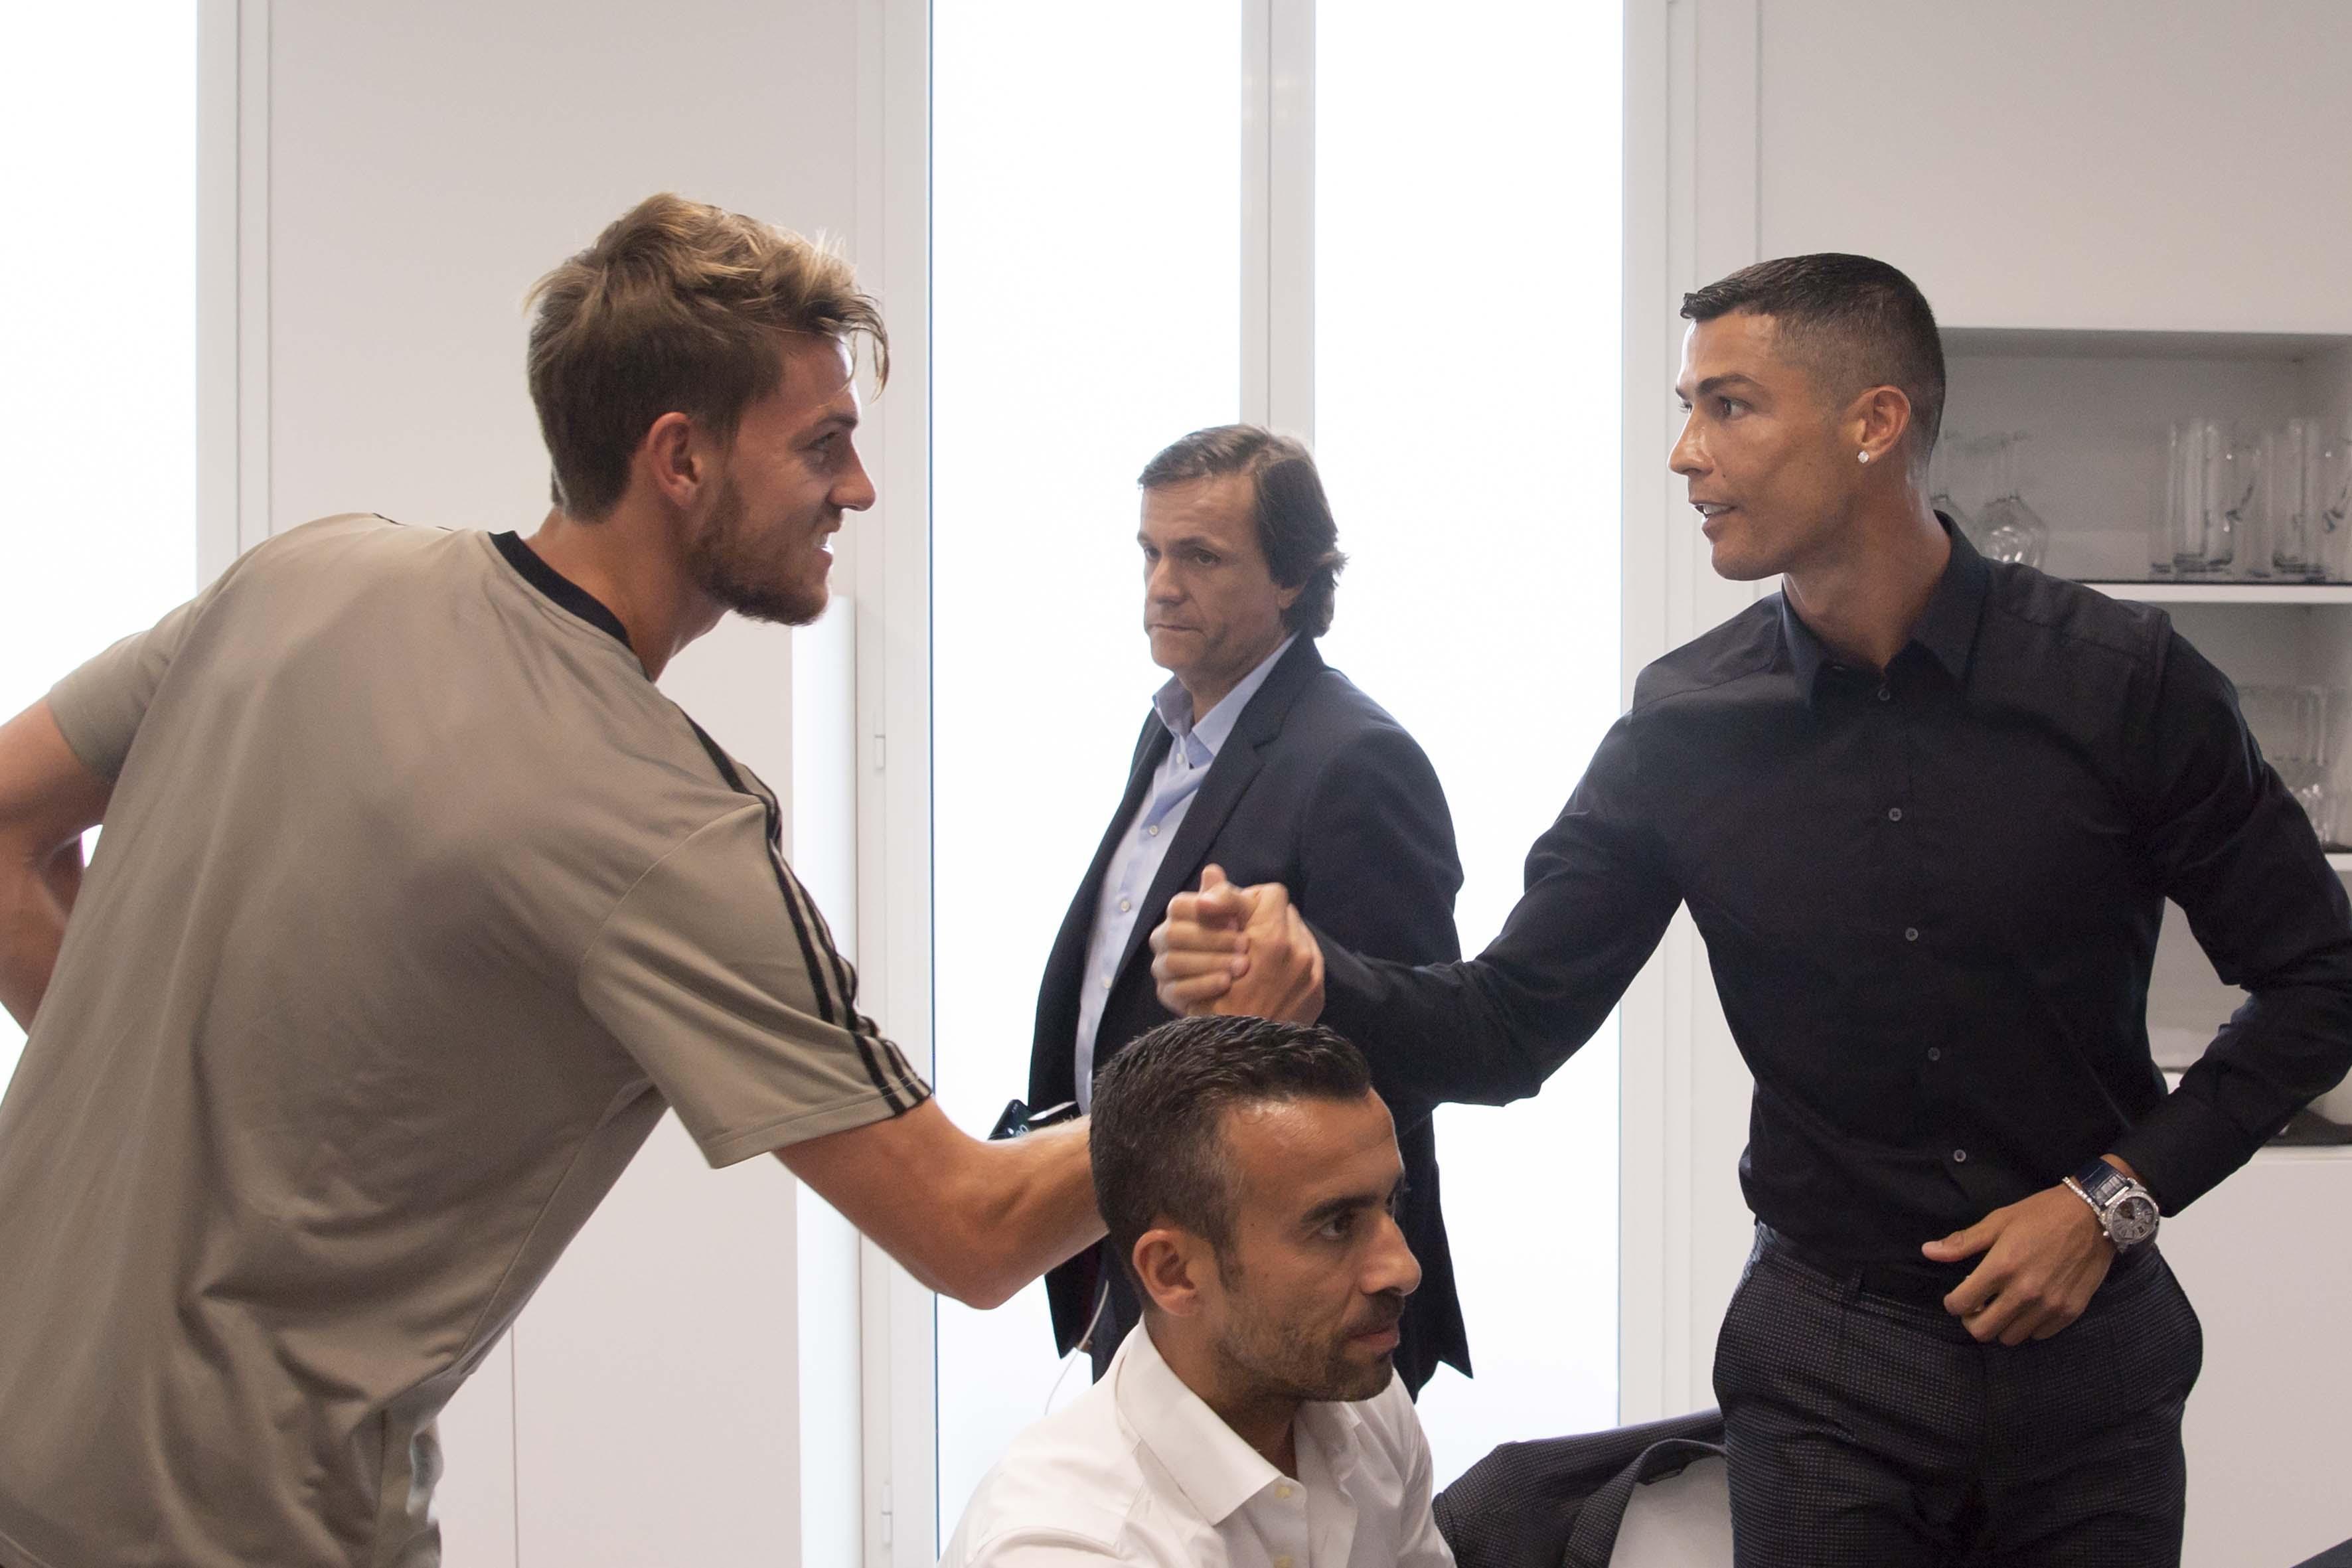 Cristiano Ronaldo has been meeting his new team-mates